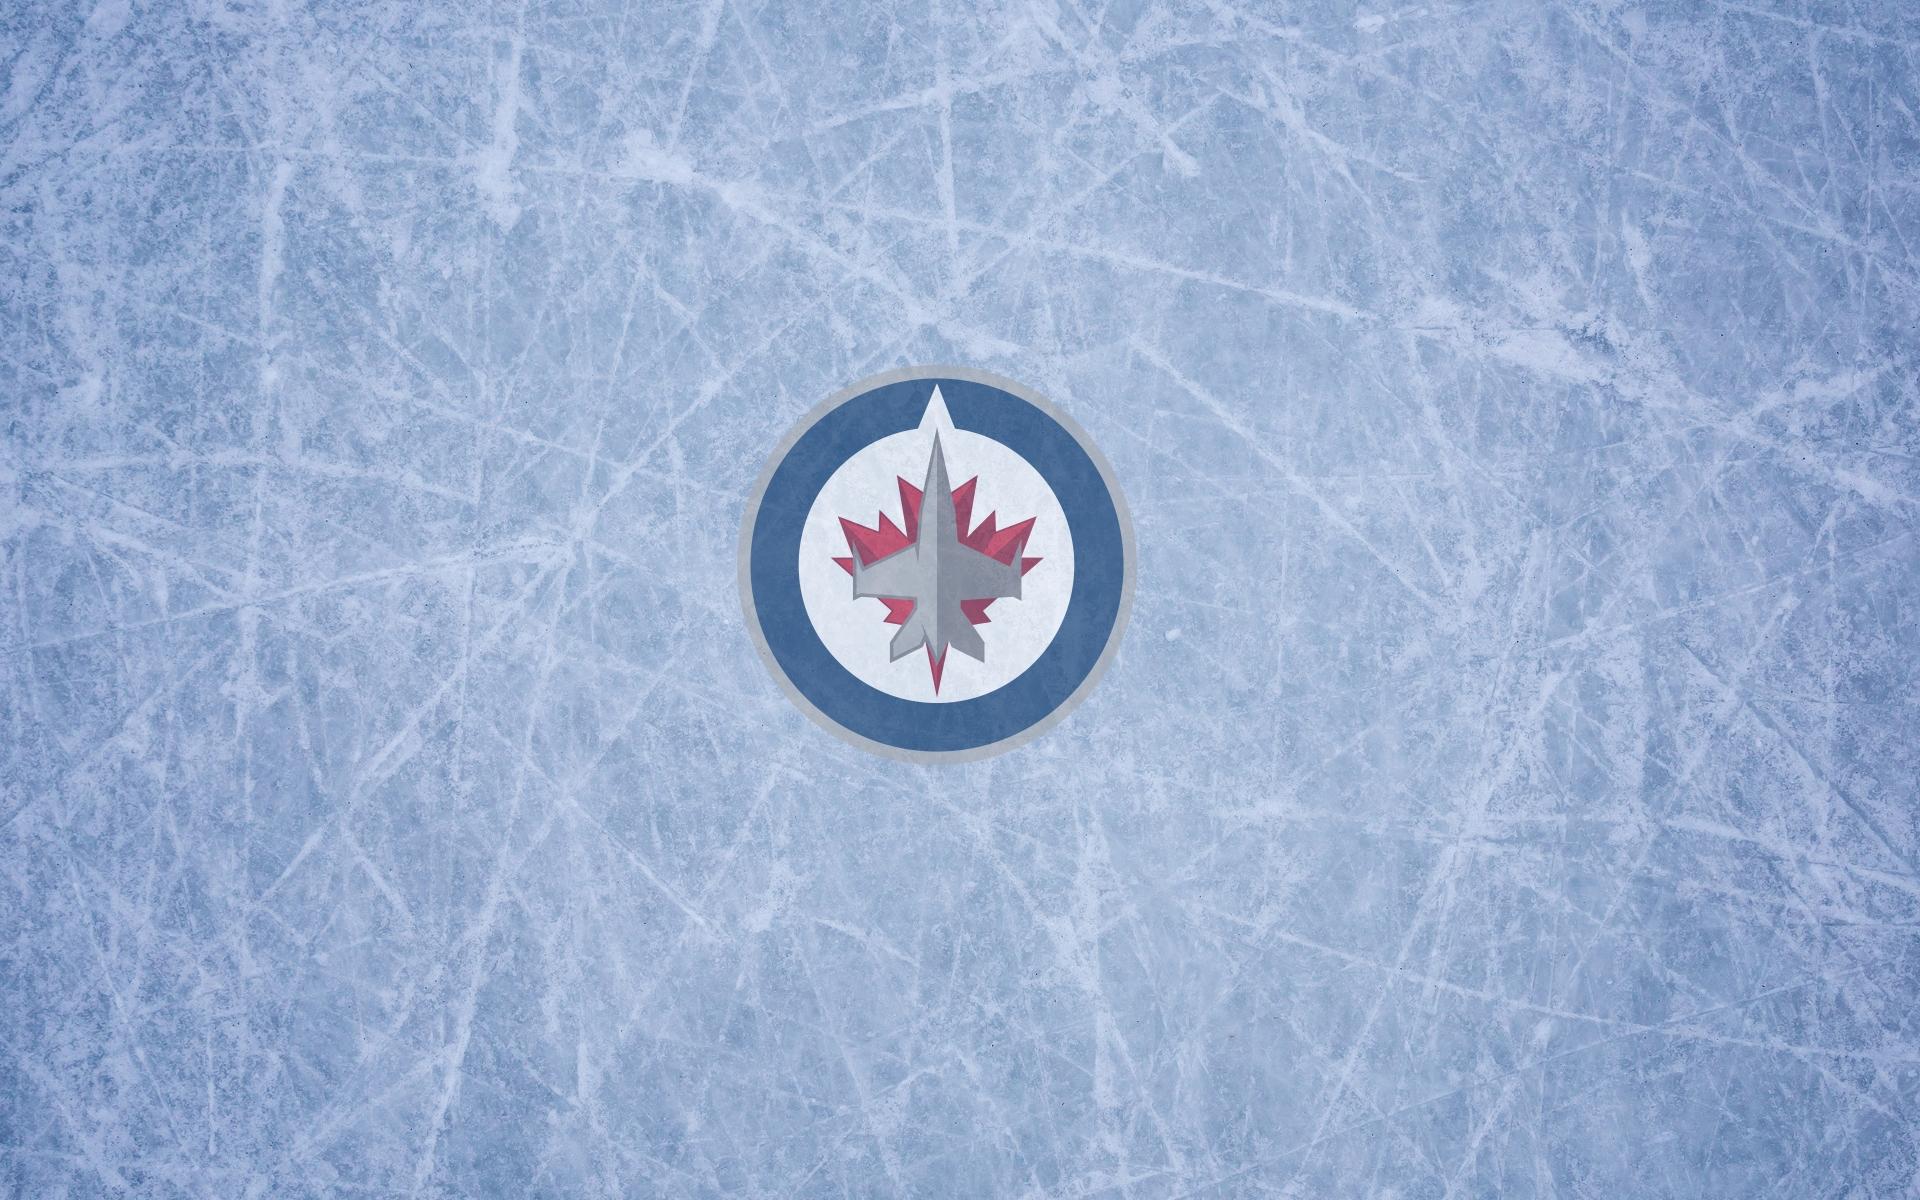 Winnipeg jets logos download - Winnipeg jets wallpaper ...